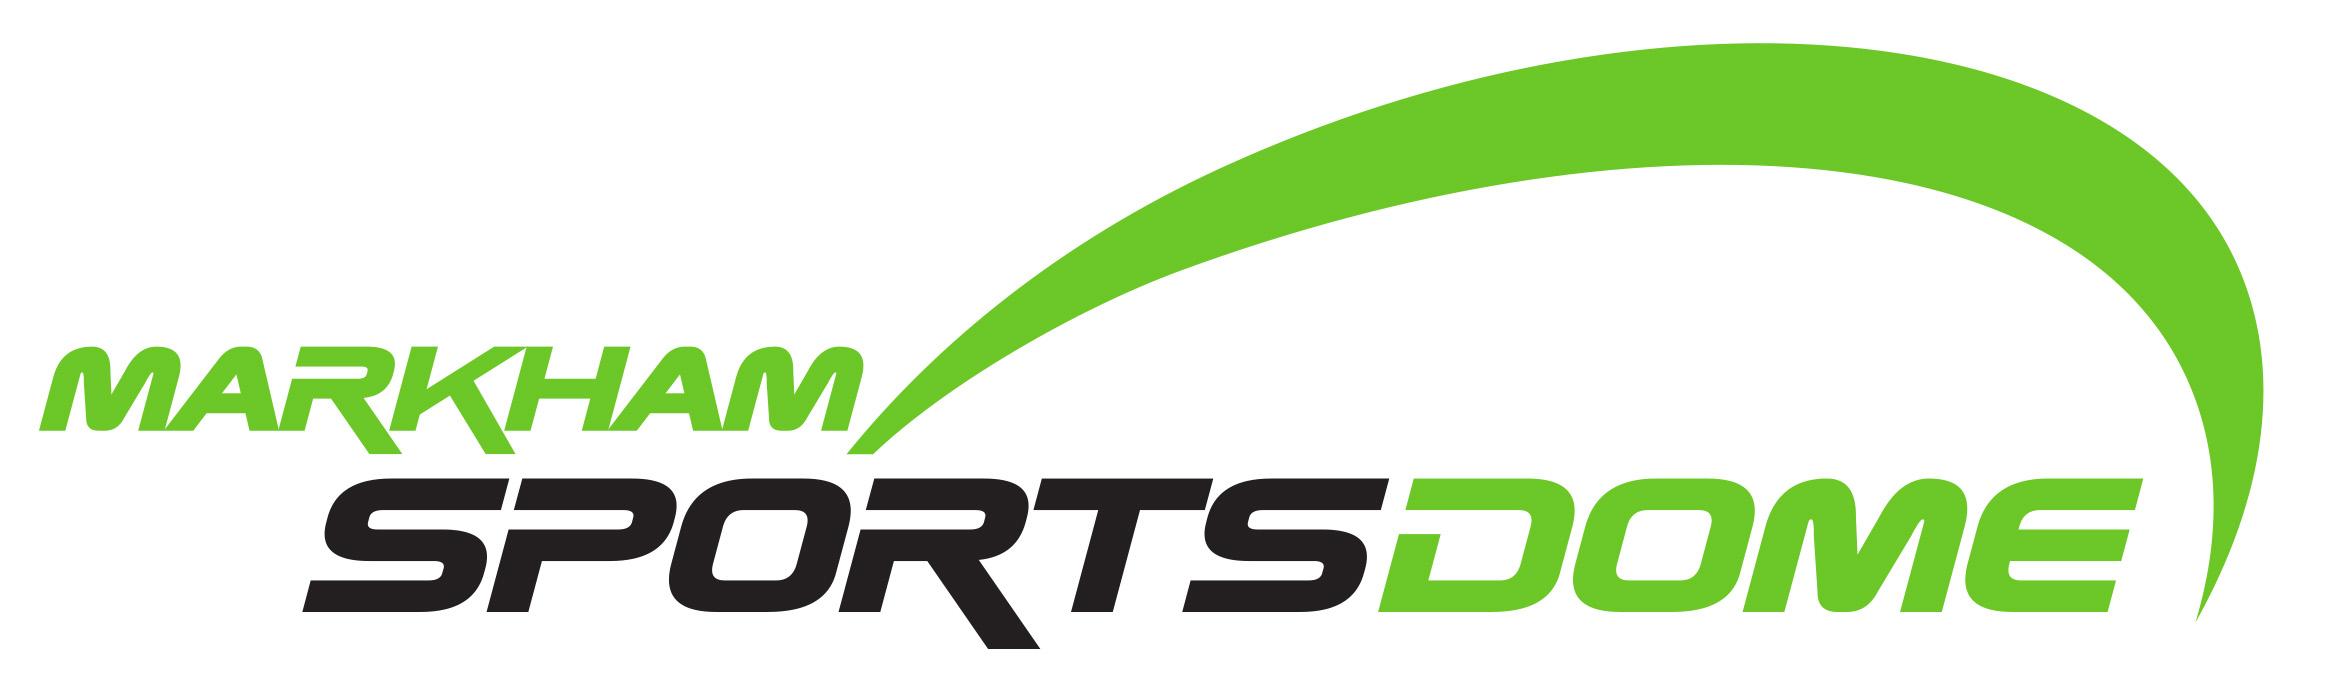 logo_FINAL_Markham